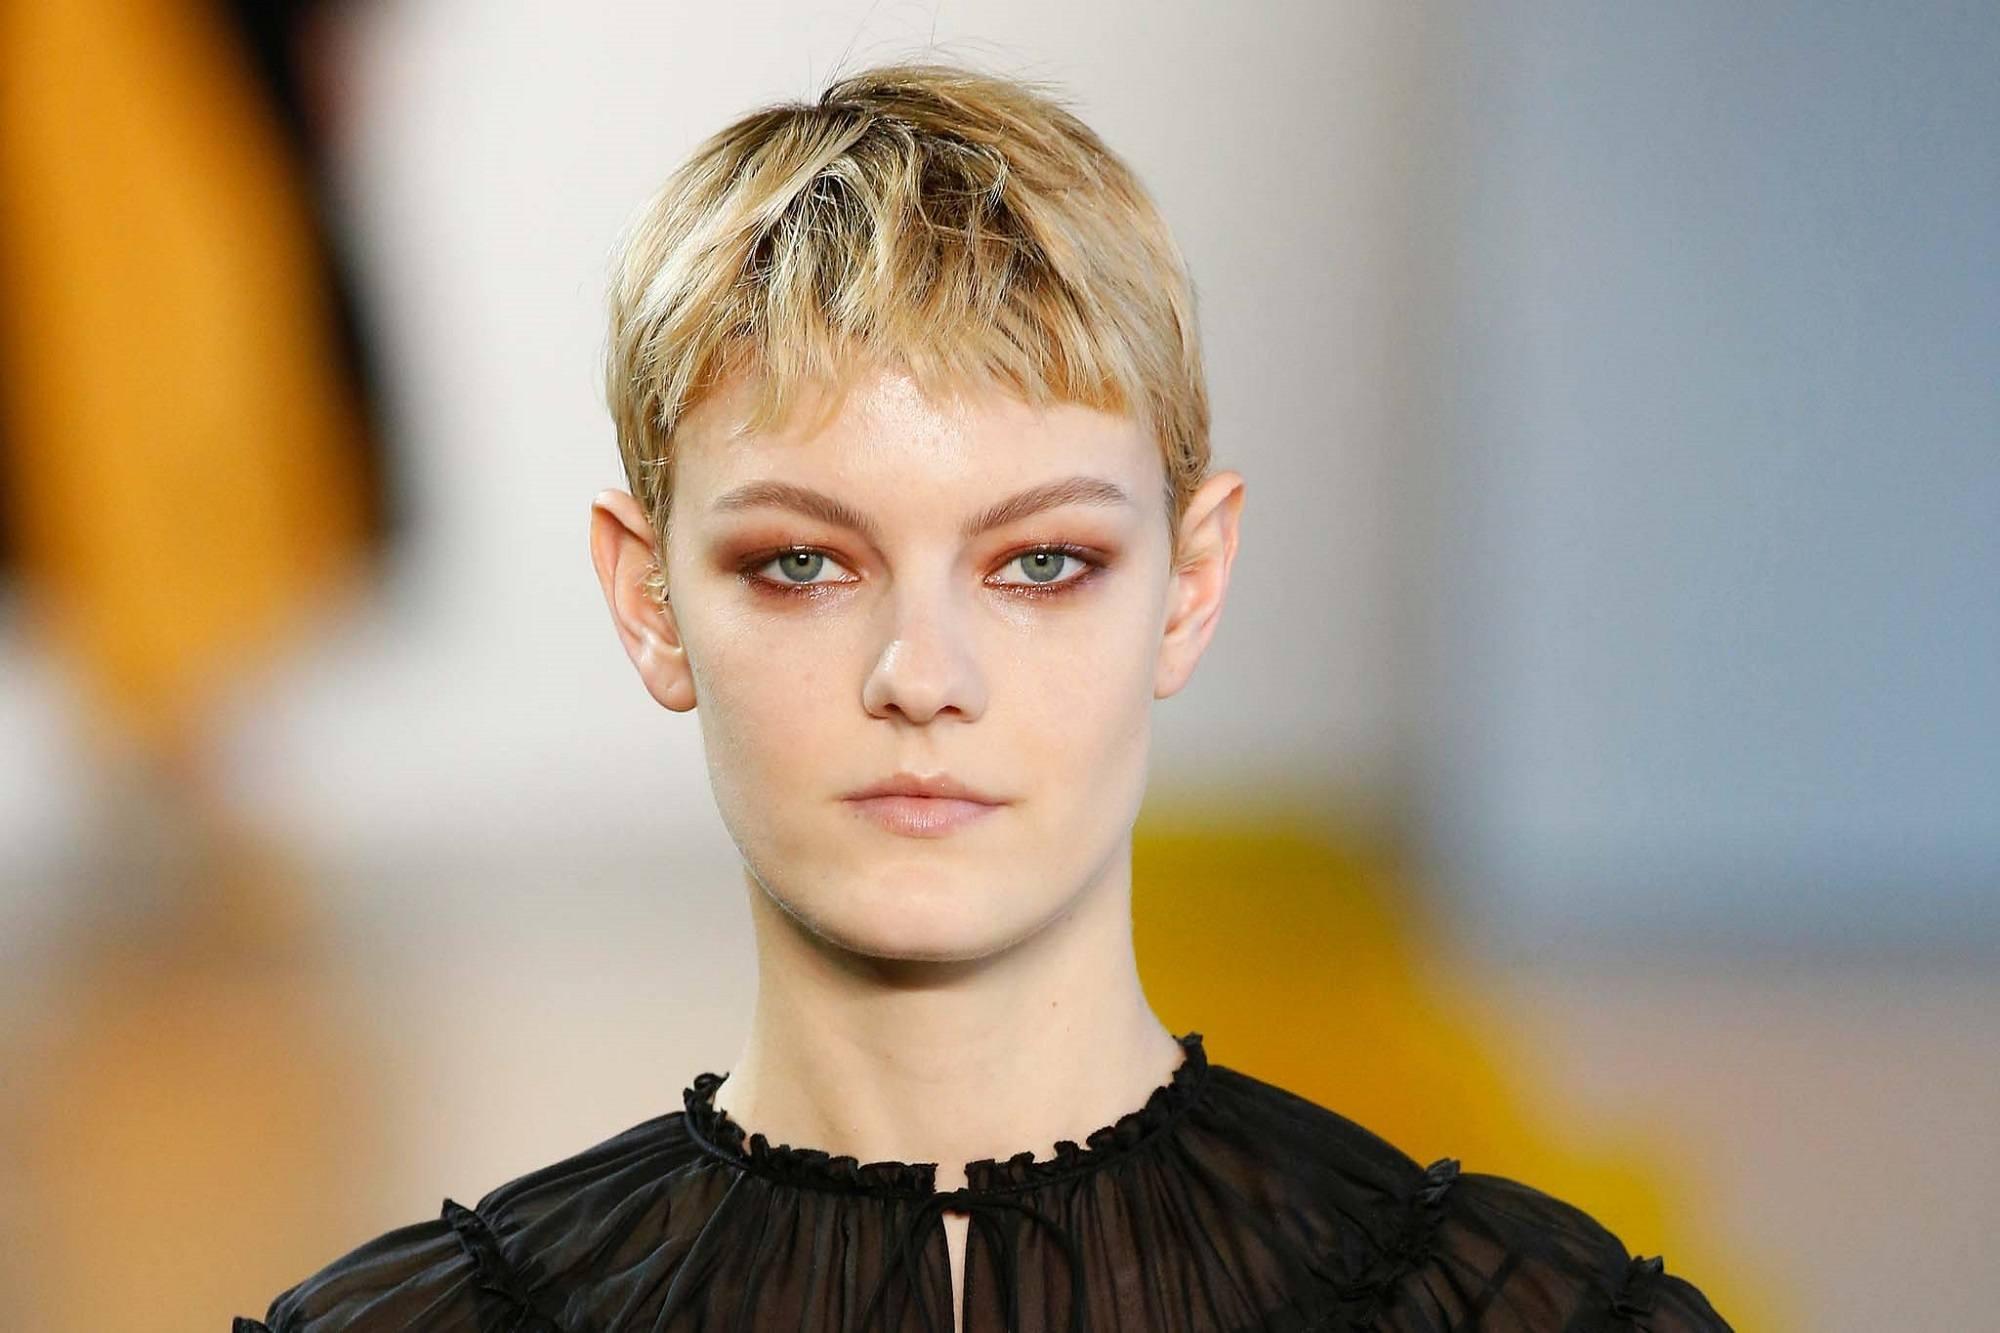 New York Fashion Week hair: Closeup shot of a woman with short blonde pixie cut wearing a black hair